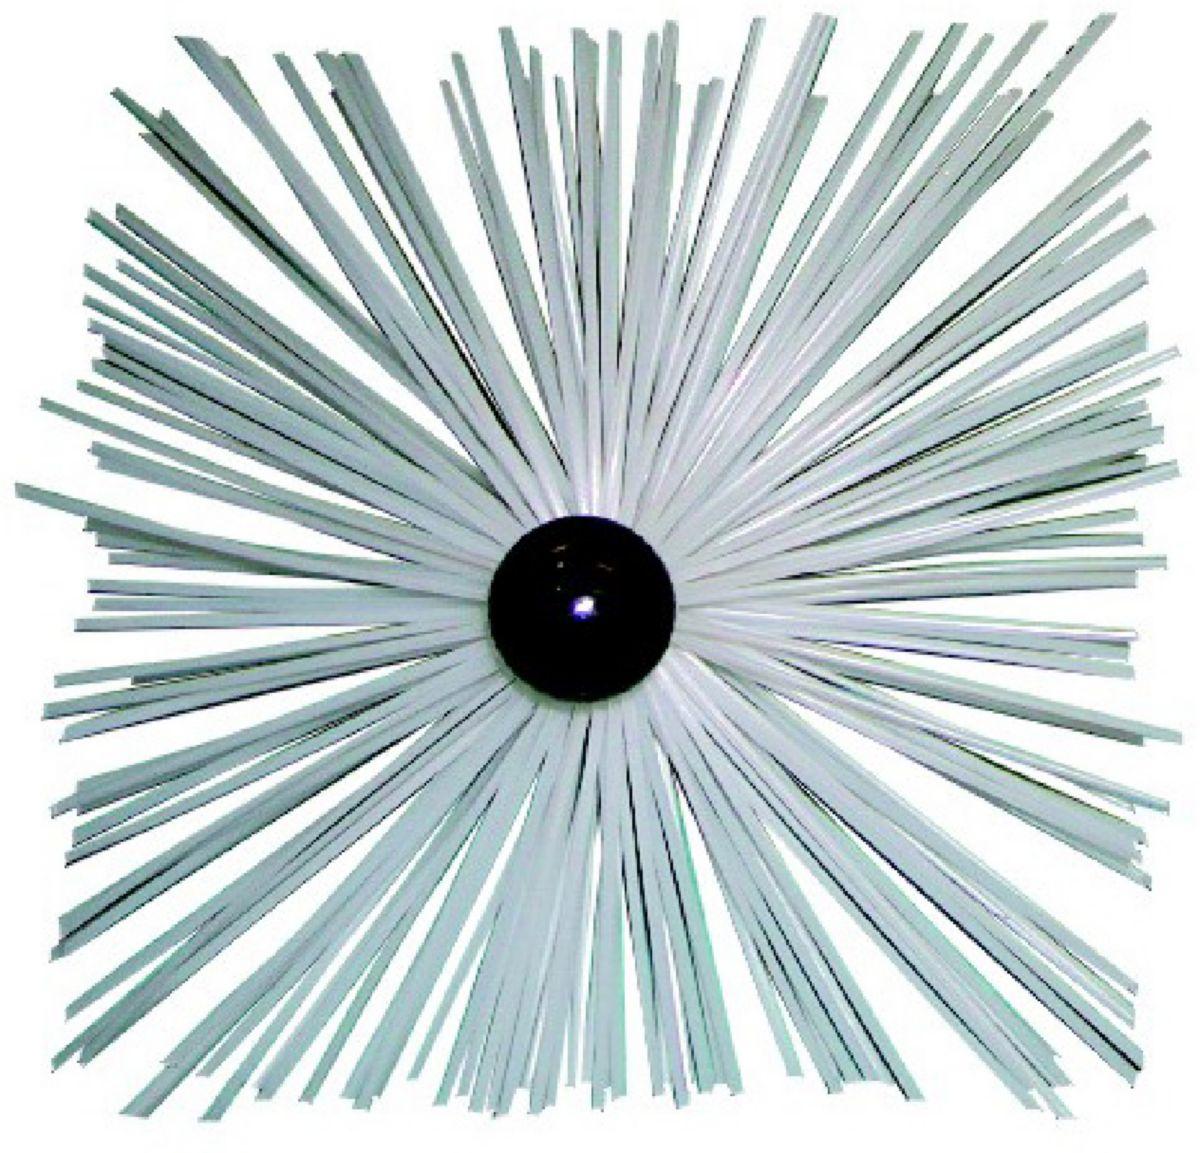 Hérisson polyamide Lg 0,25 m Larg : 250 mm Réf. 1616